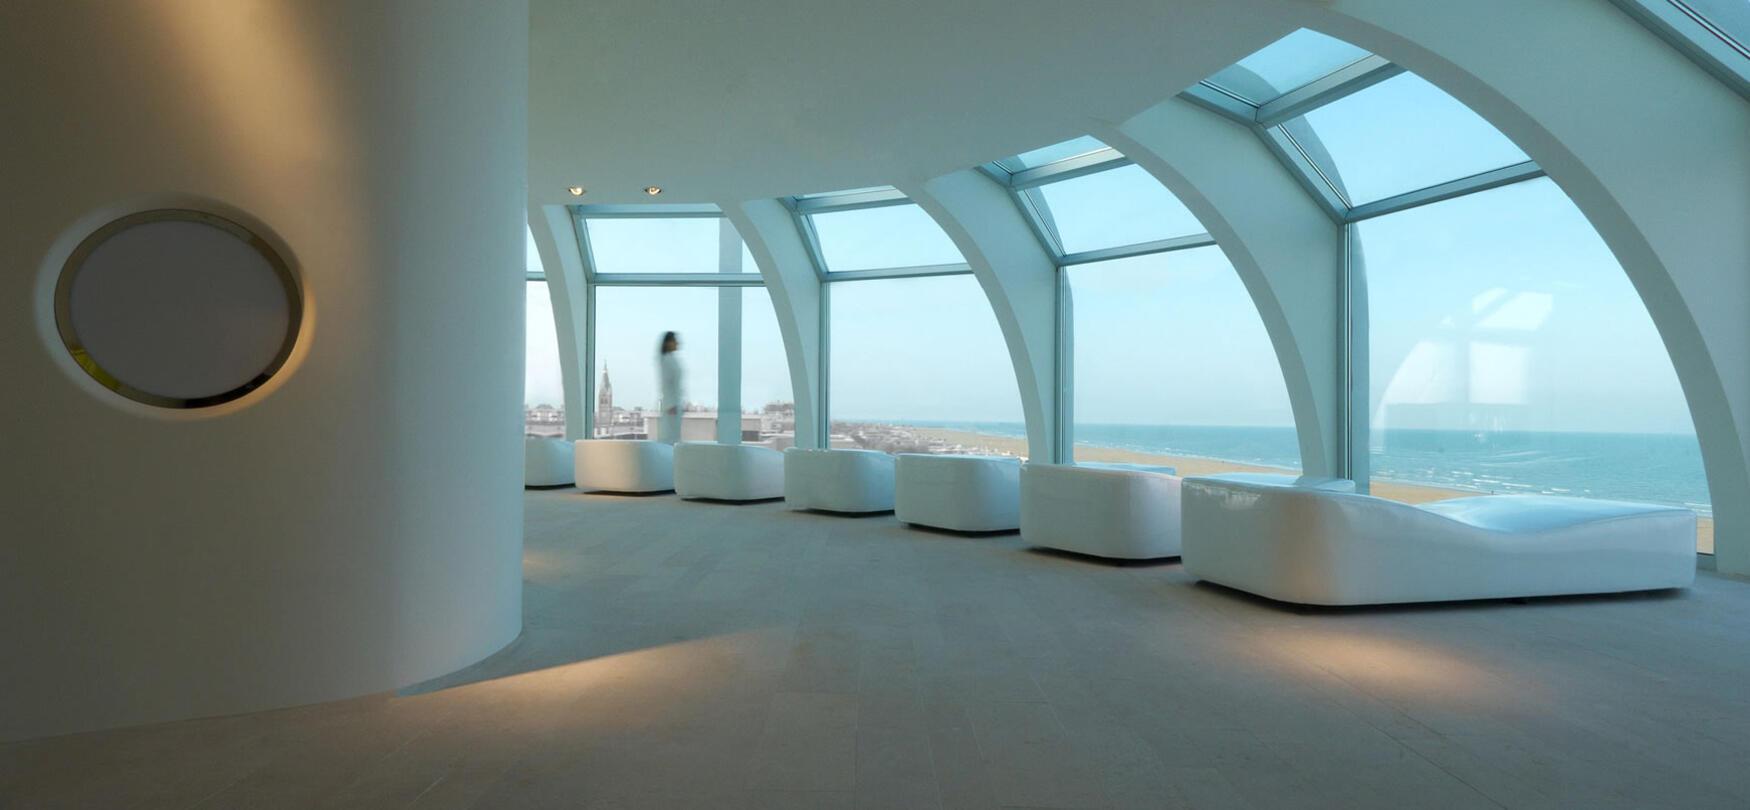 ambienthotels it hotel-centro-benessere-rimini 006